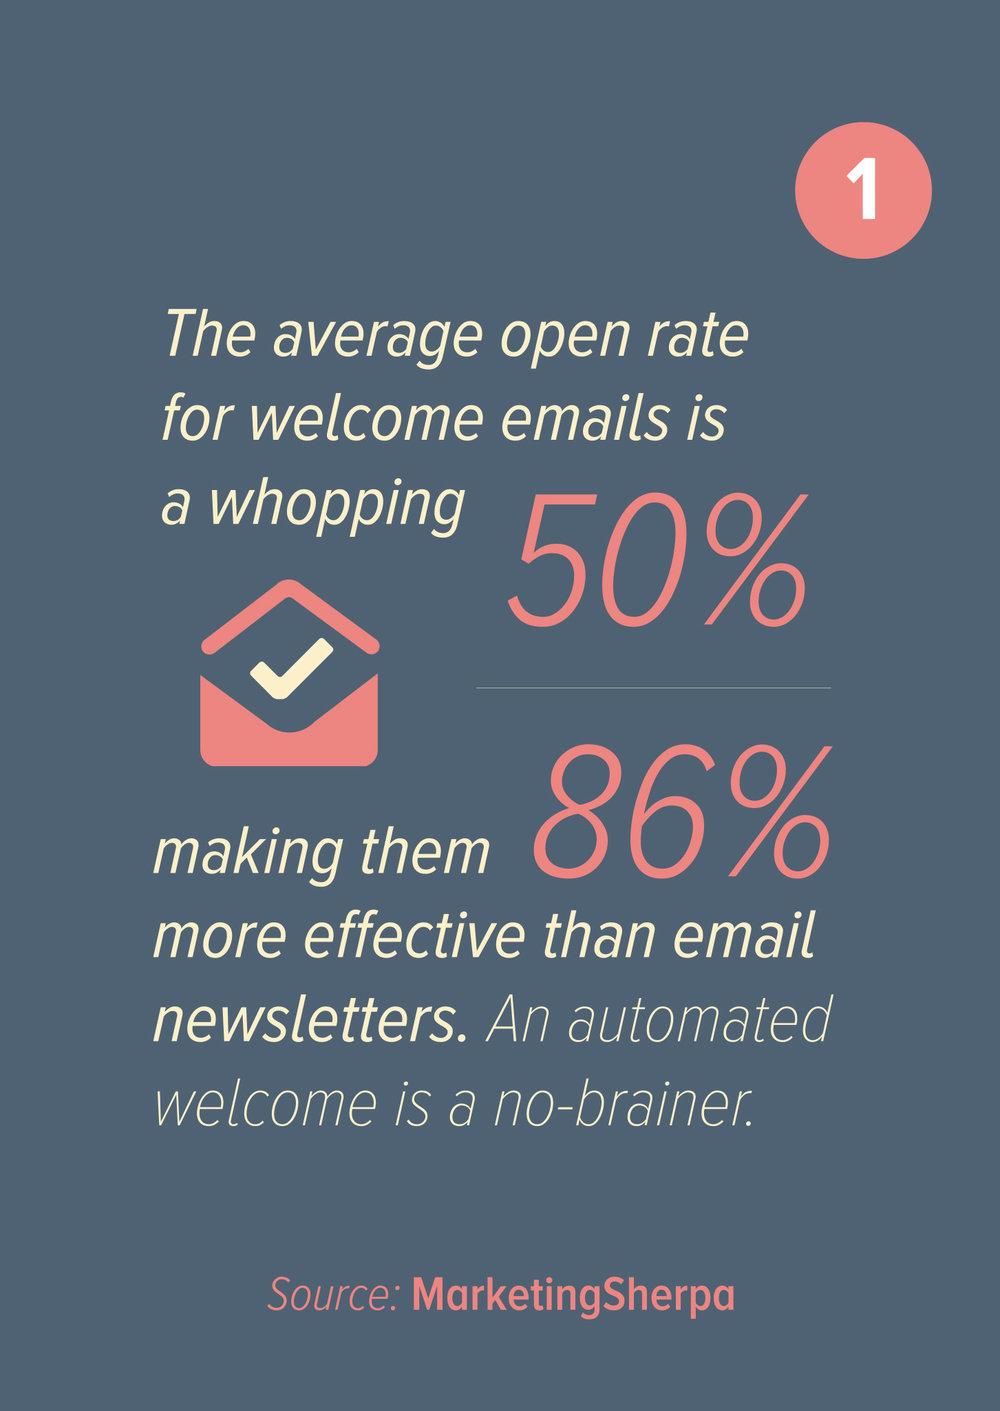 Source:https://www.slideshare.net/kingdevil/email-marketing-statistics-quotes-and-tips-shared-by-brands-via-pallabslides